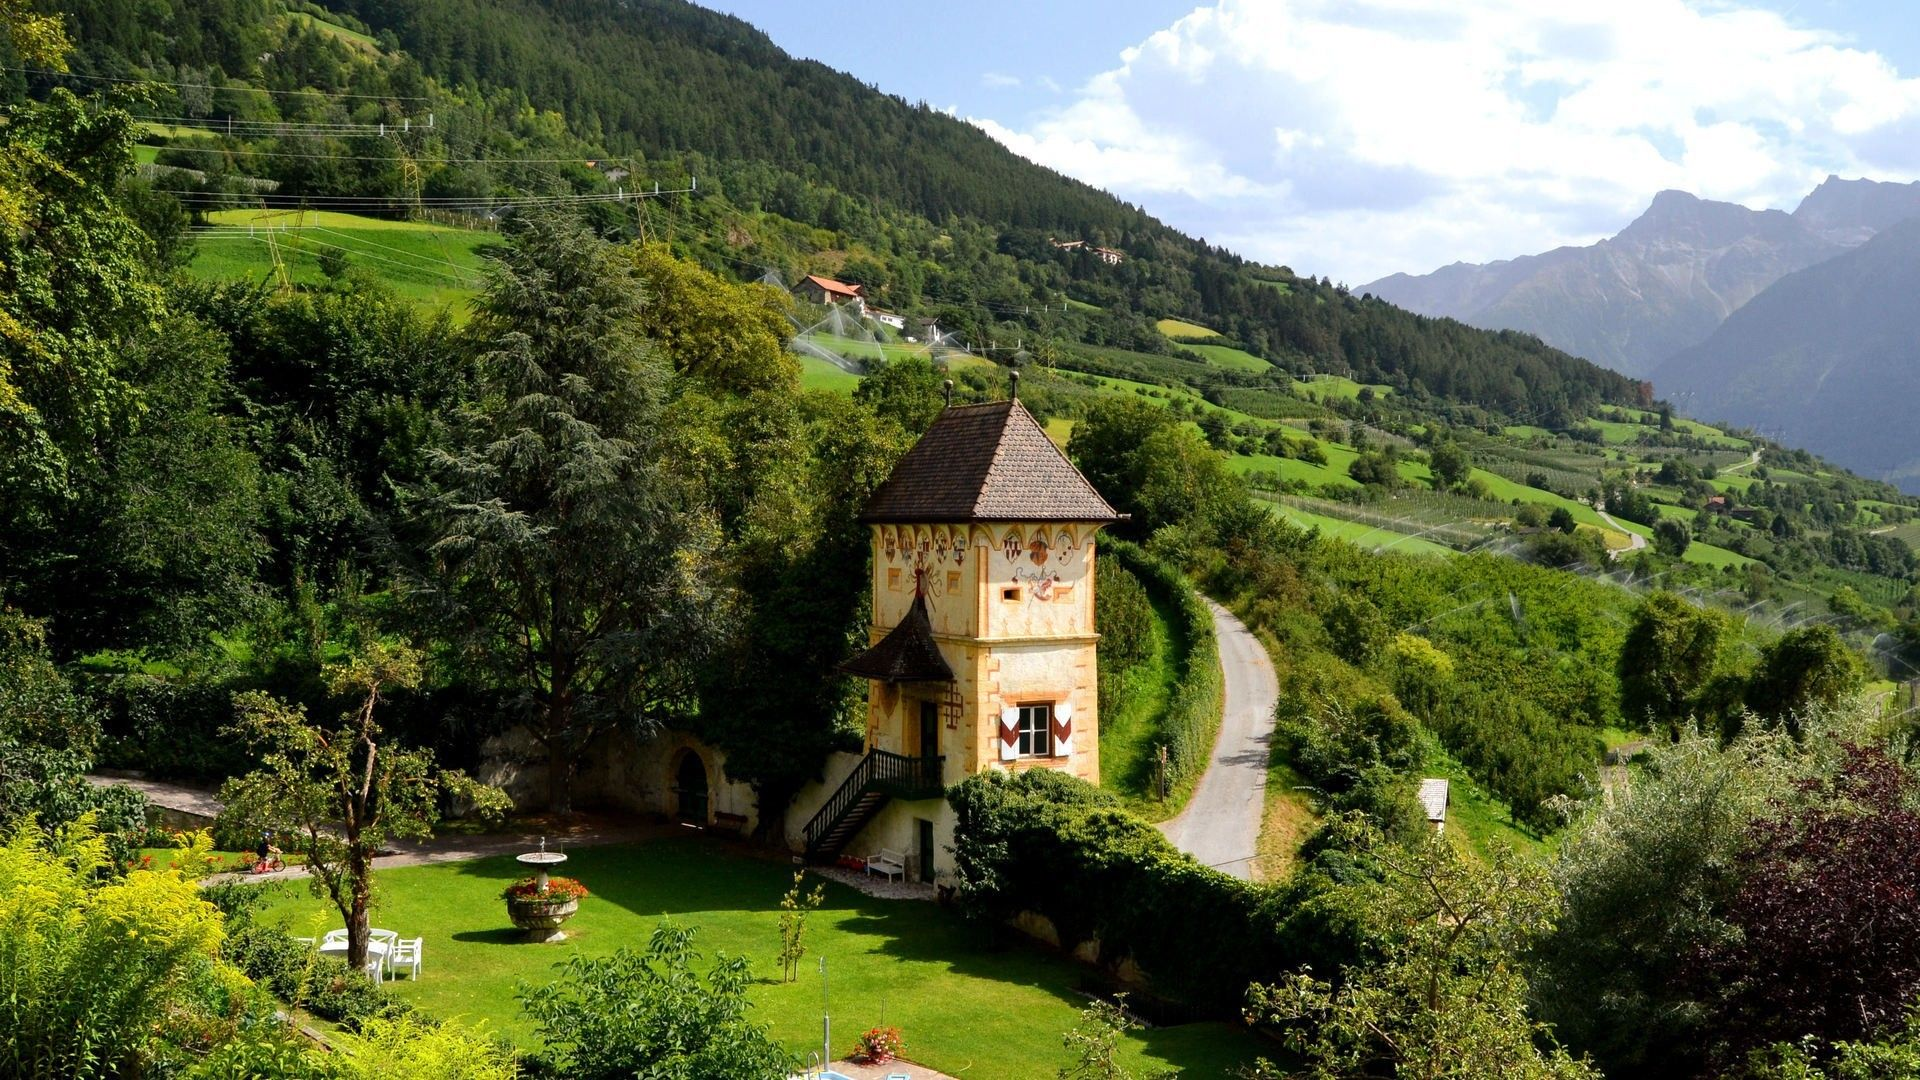 Wonderful Bavarian House In The Mountains 1920x1080 Bavarian